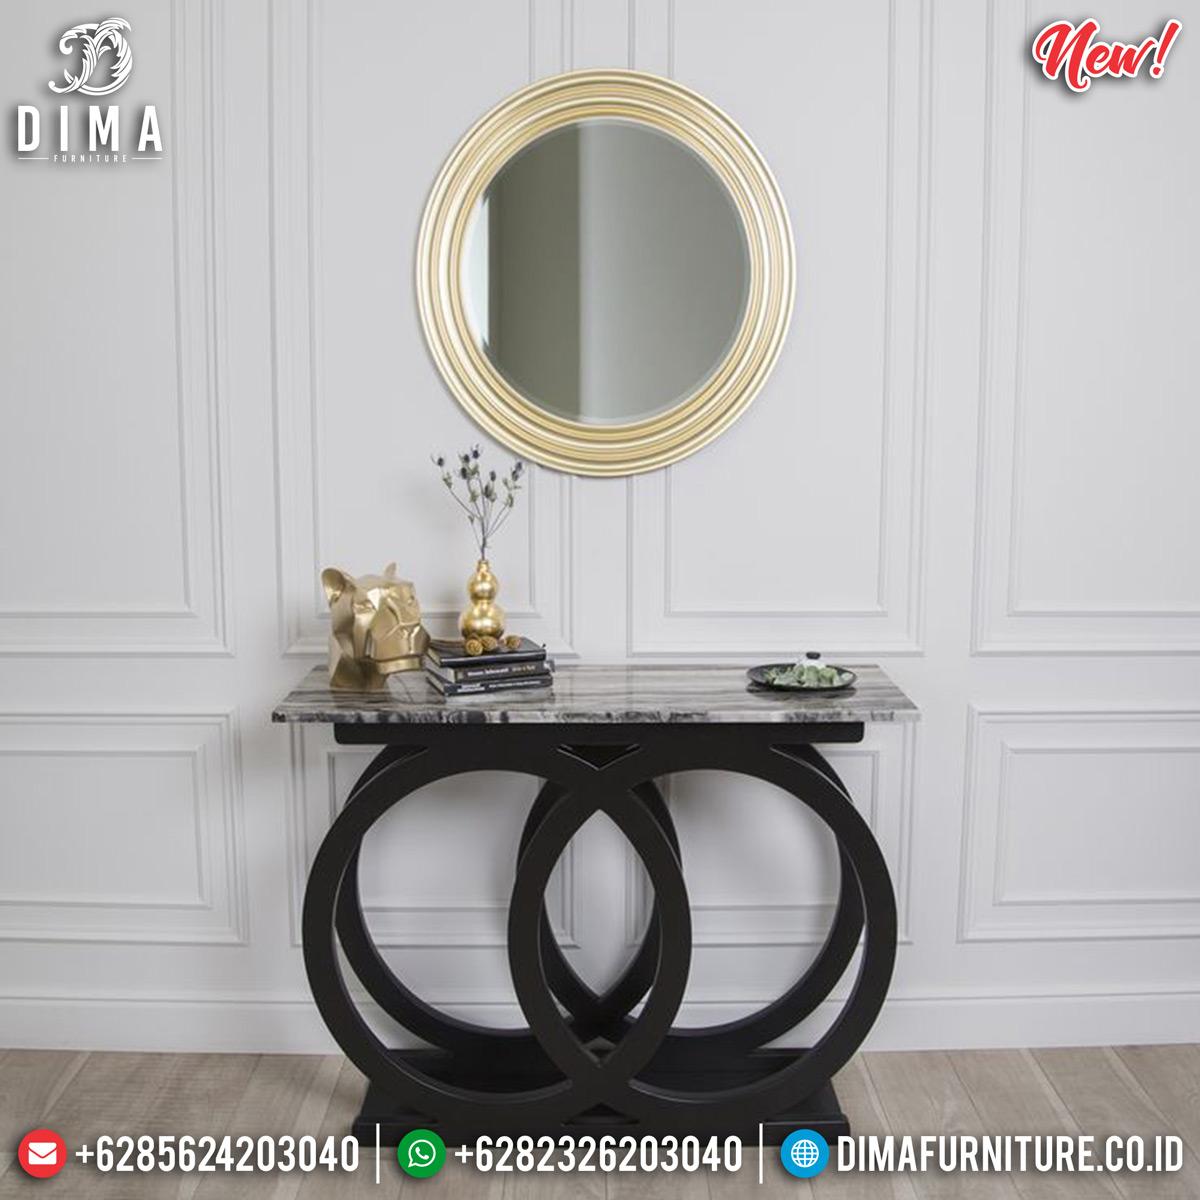 Harga Meja Konsol Minimalis Modern Jepara New Luxury Style TTJ-0862